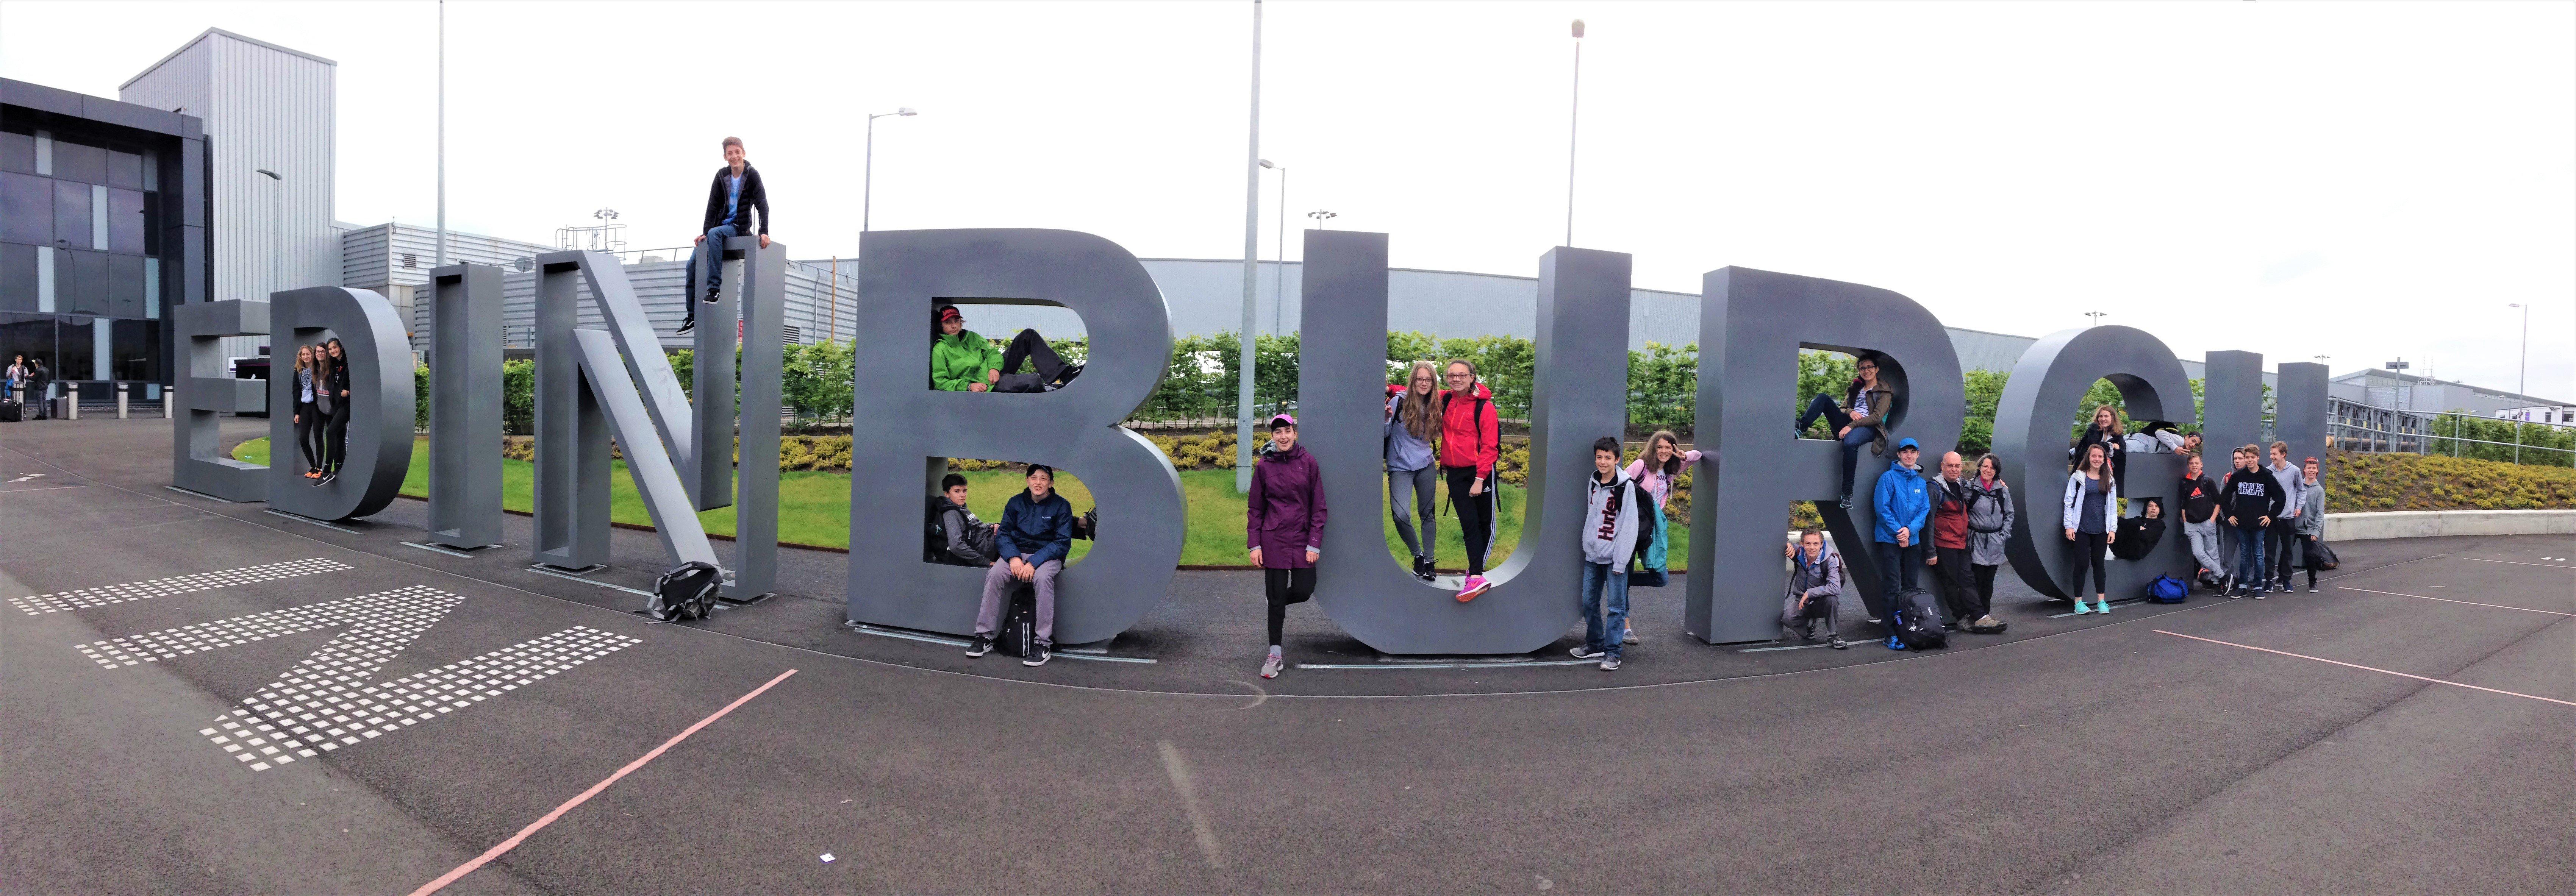 JSED_Scotland_Student group pic in Edinburgh